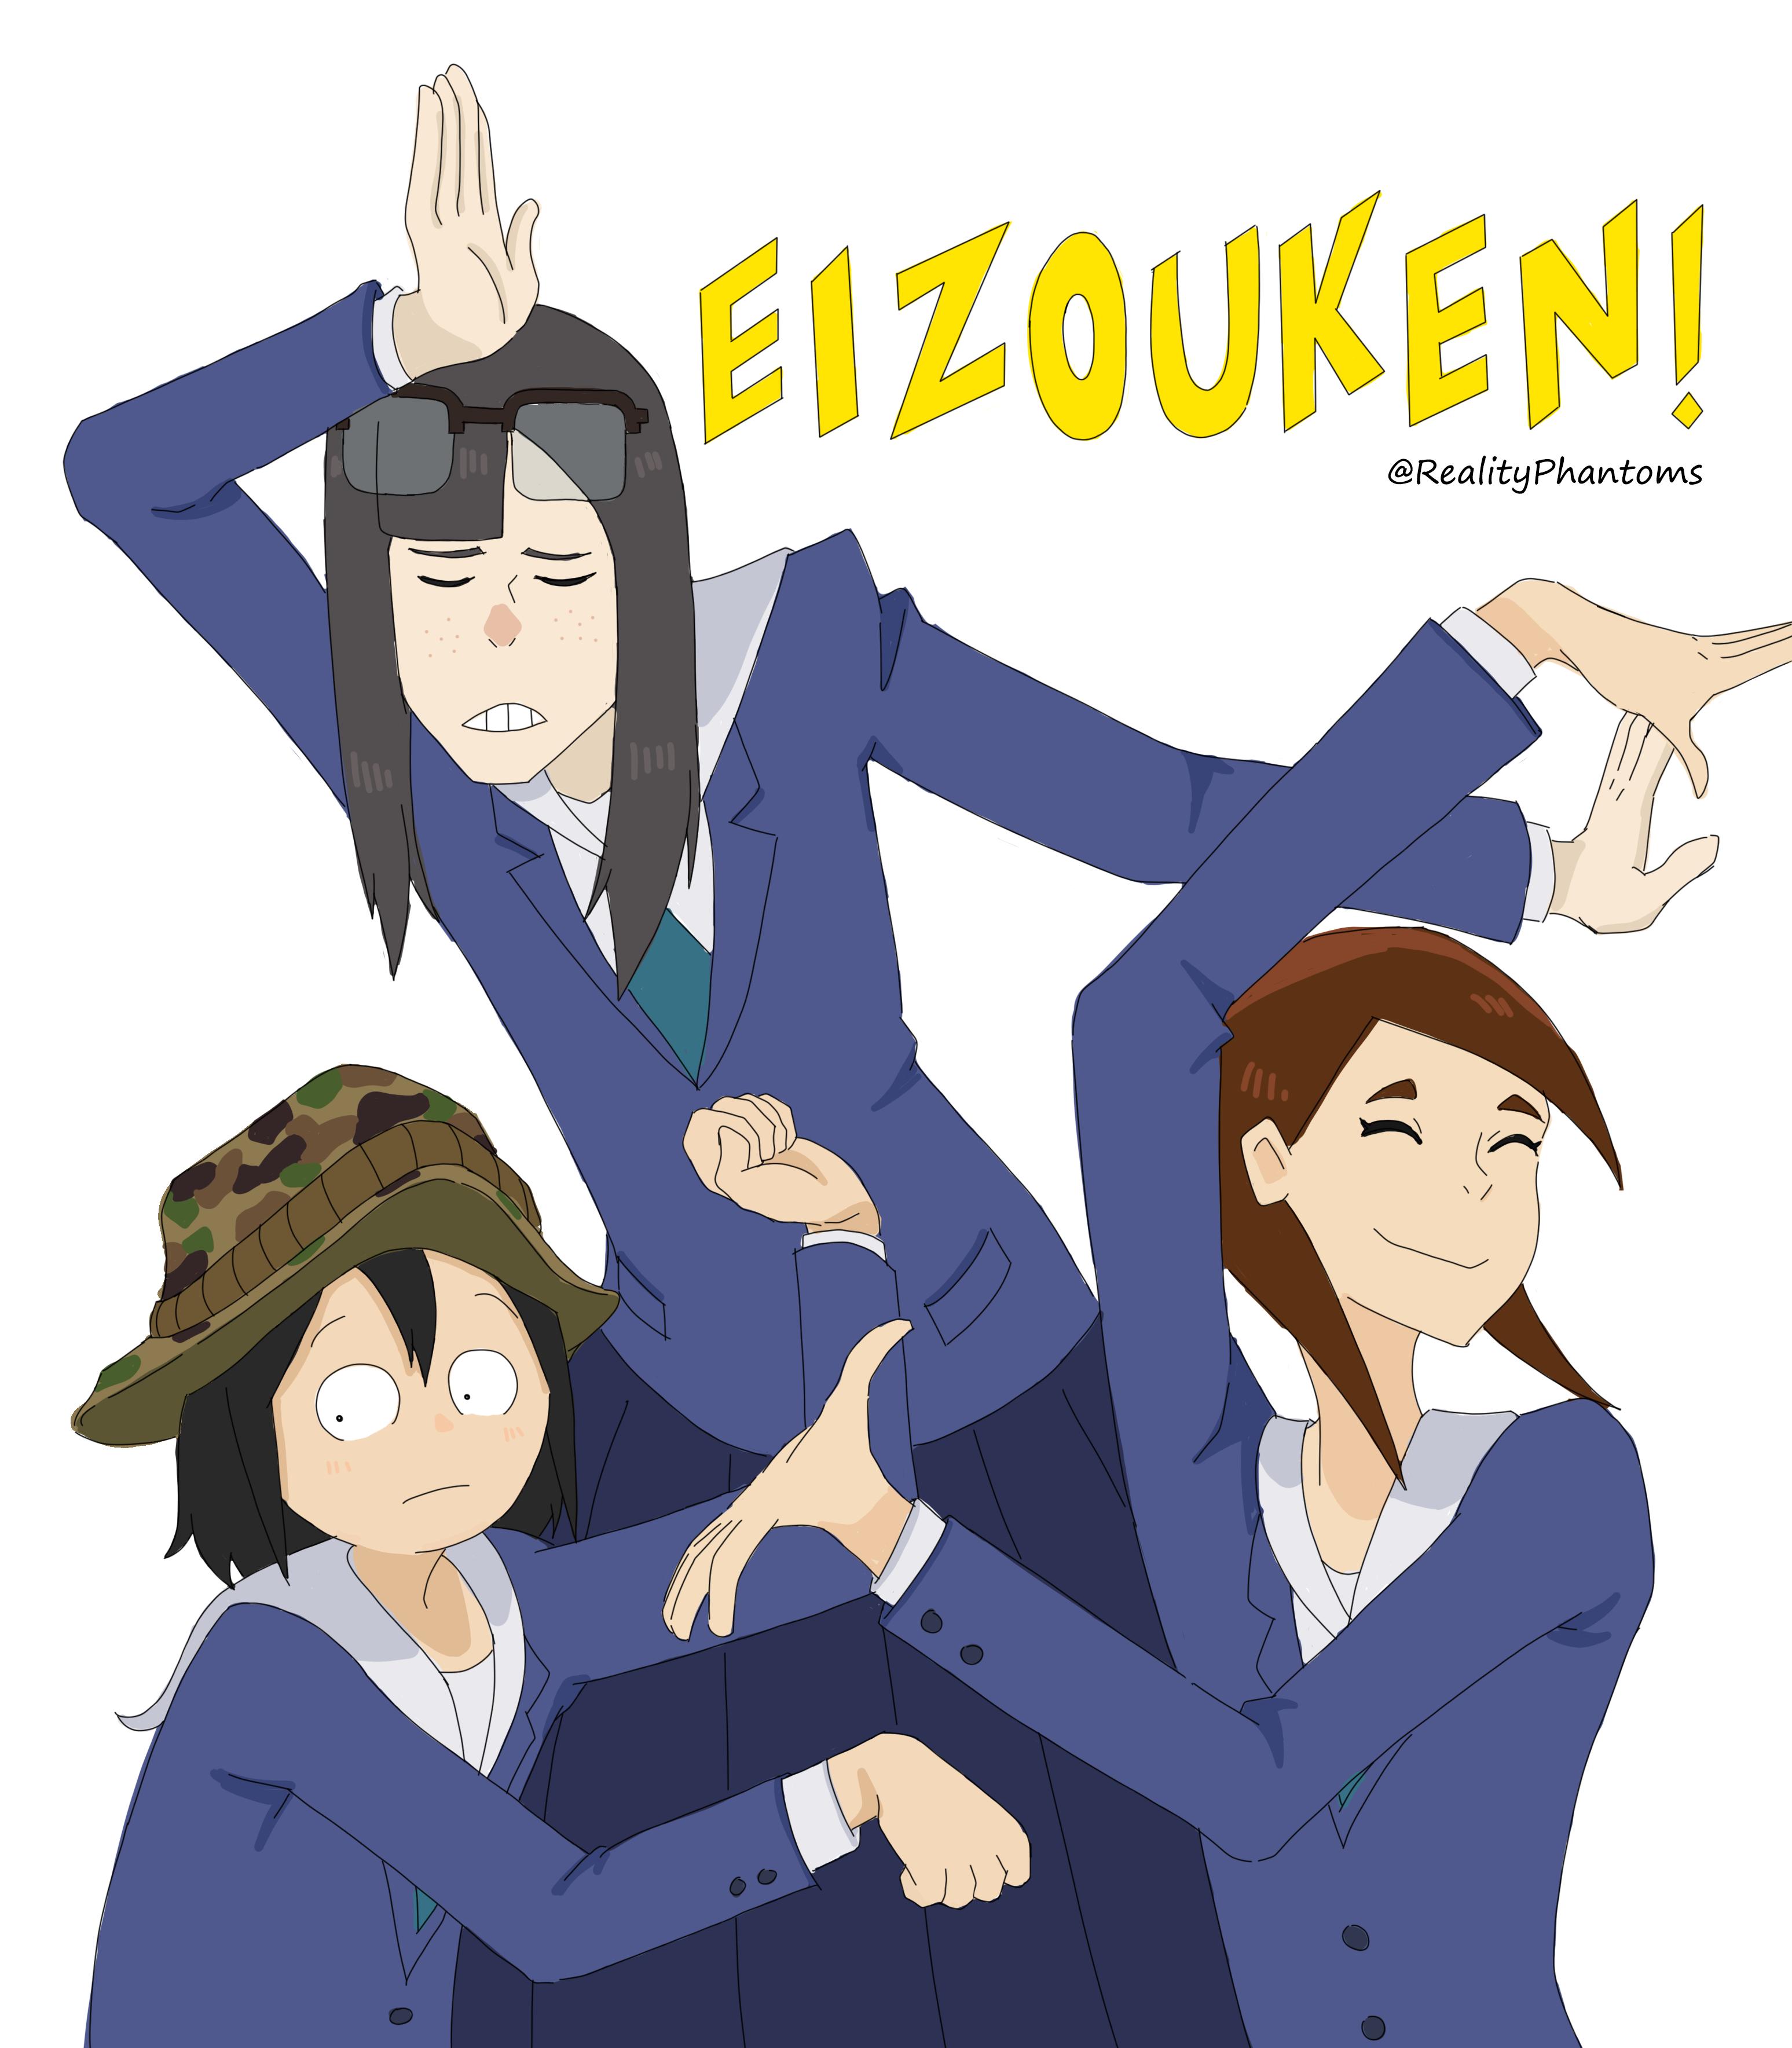 Reality Phantoms On Twitter In 2020 Anime Fanart Anime Art